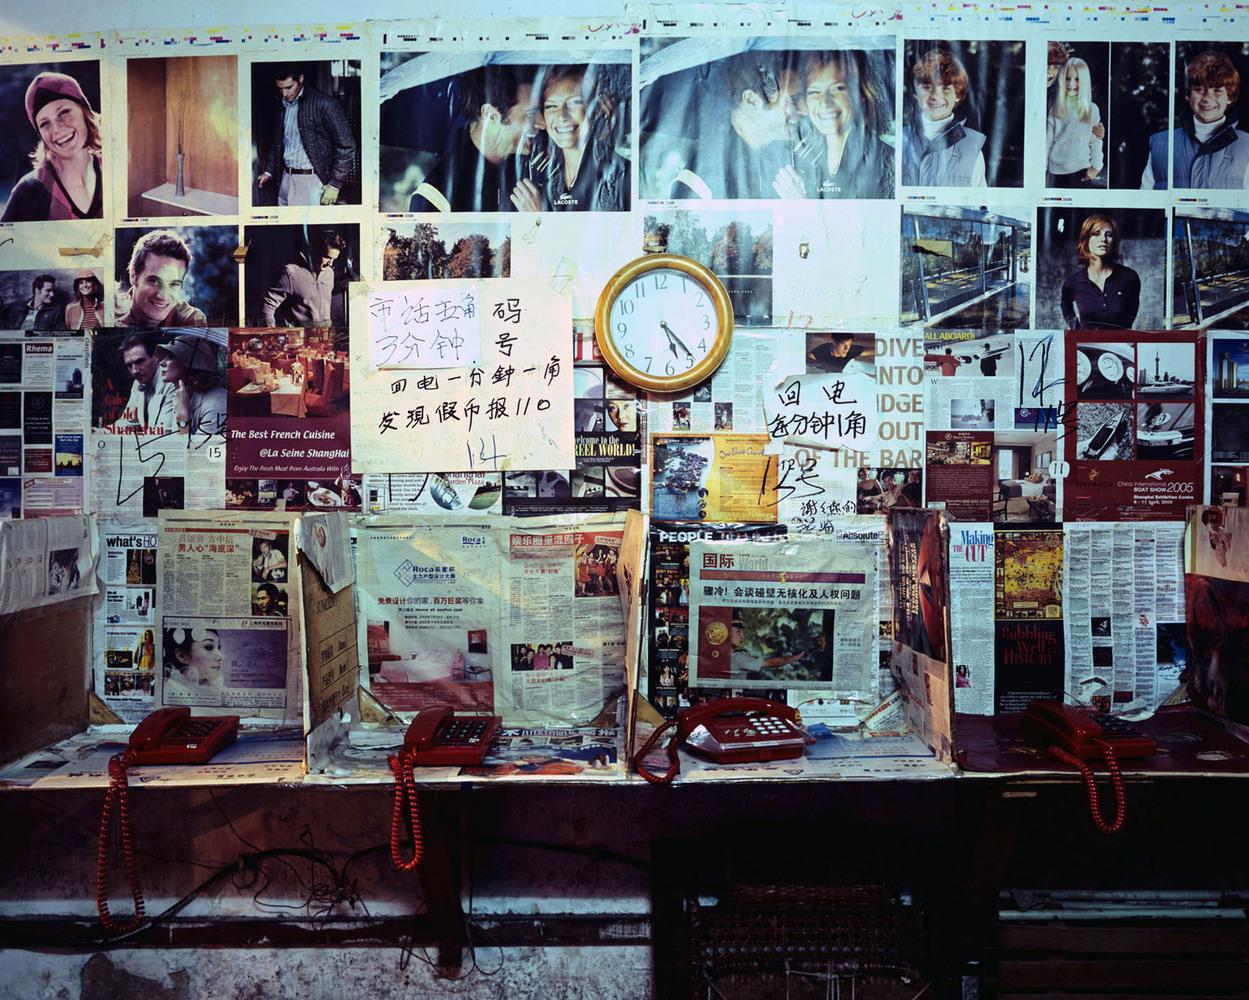 30+ La Social Shanghai Wallpapers